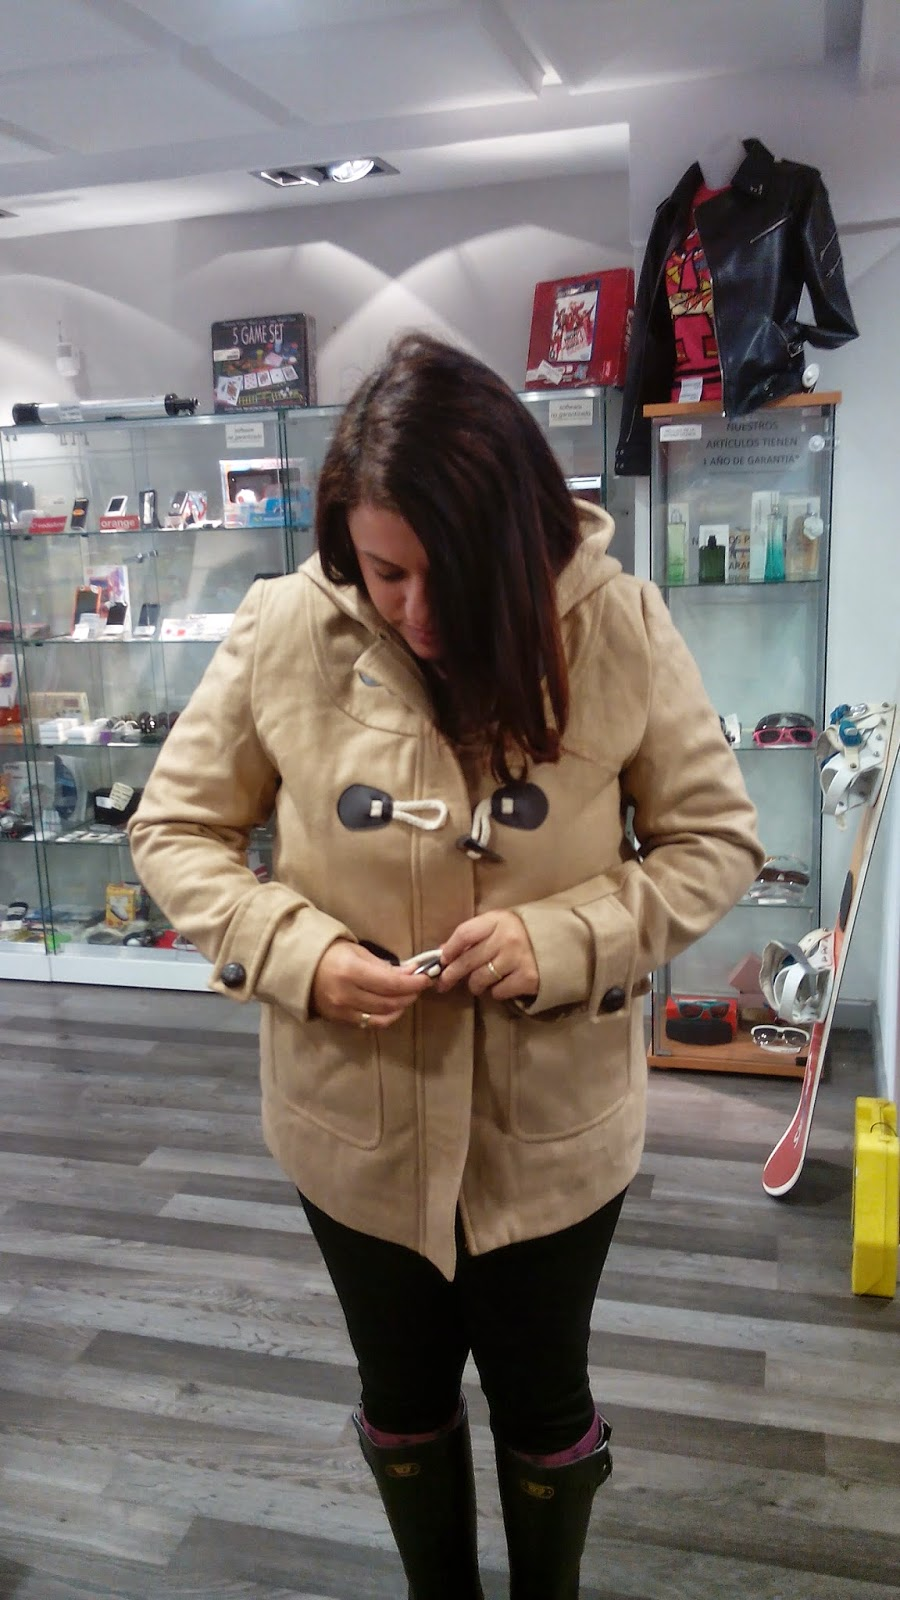 http://www.choies.com/product/wool-blend-hooded-duffle-coat-in-khaki_p30936?cid=3957jesspai